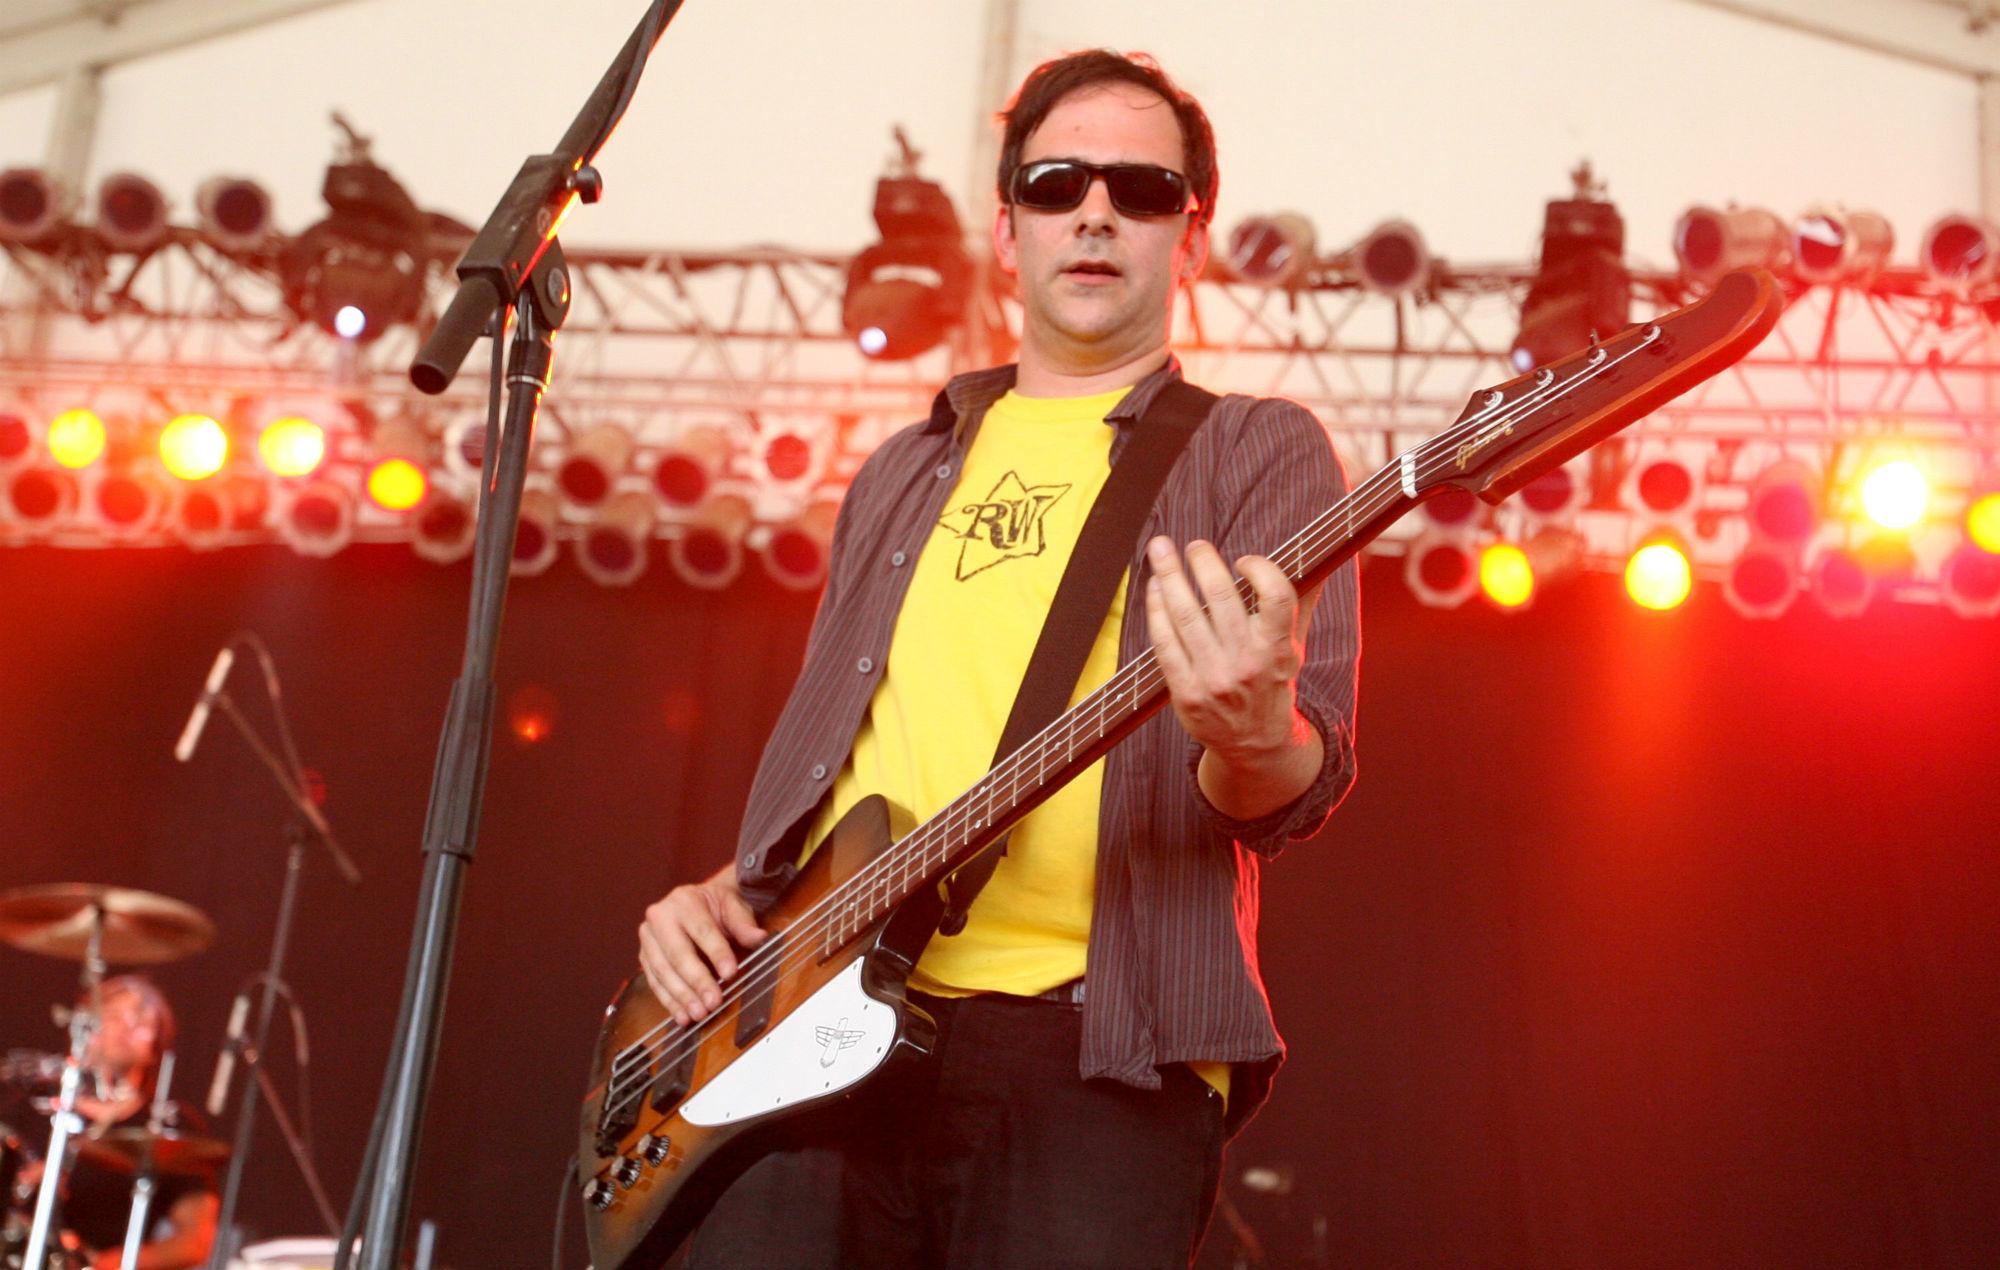 Adam Schlesinger's 10 best songs